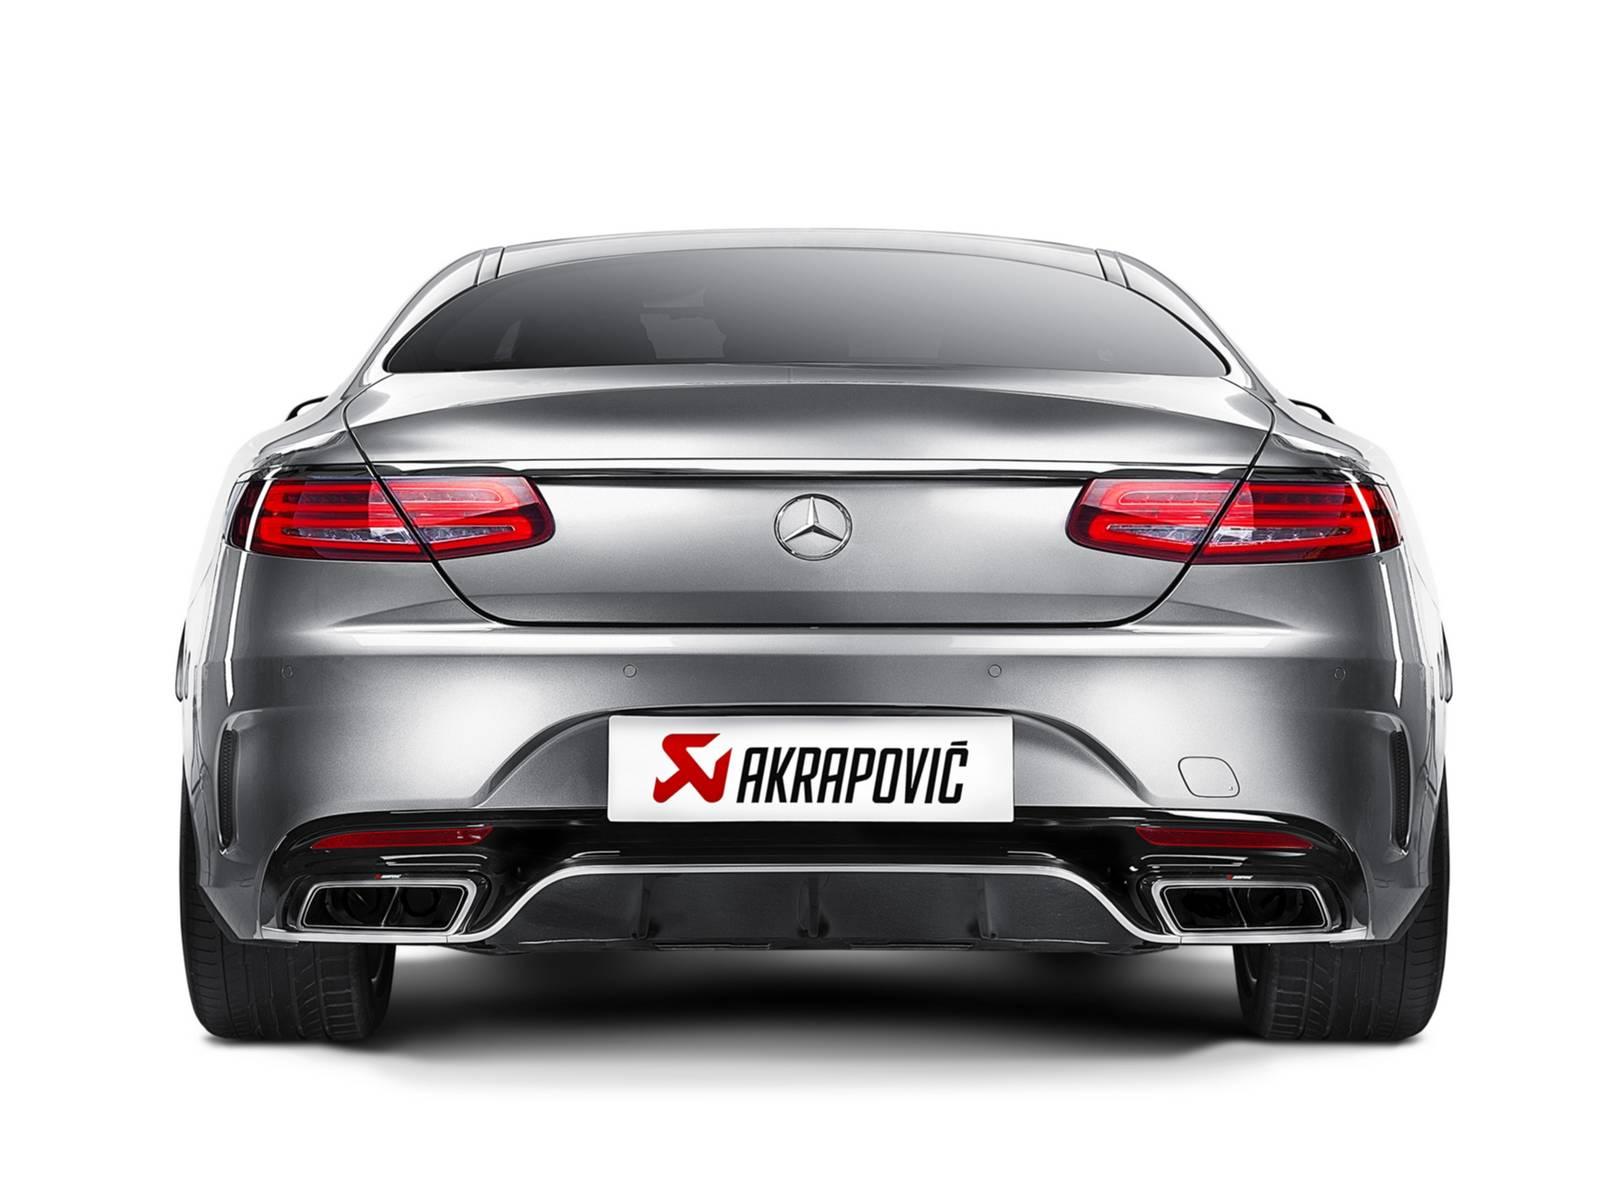 Akrapovic Launches Mercedes Benz S63 Amg Coupe Titanium